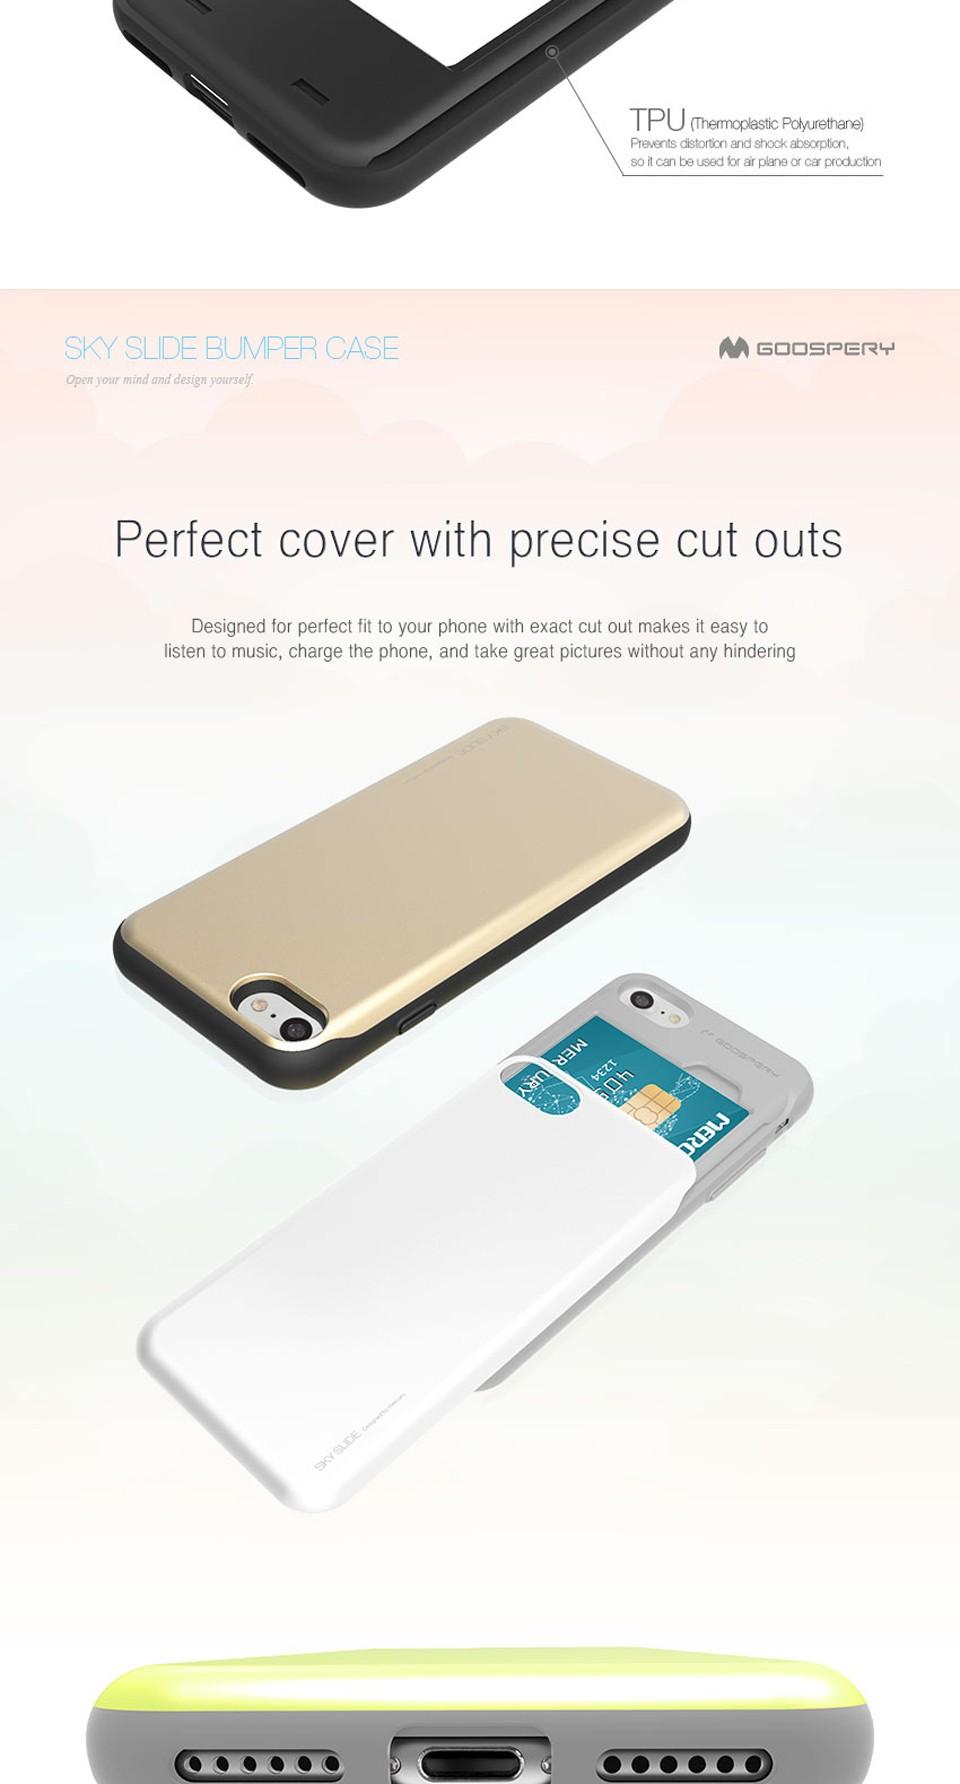 Original Brand Card Wallet Phone Case For Iphone 6 6s 7 Plus Goospery Sky Slide Bumper Red Ip7 Detail Eng 01 02 03 04 05